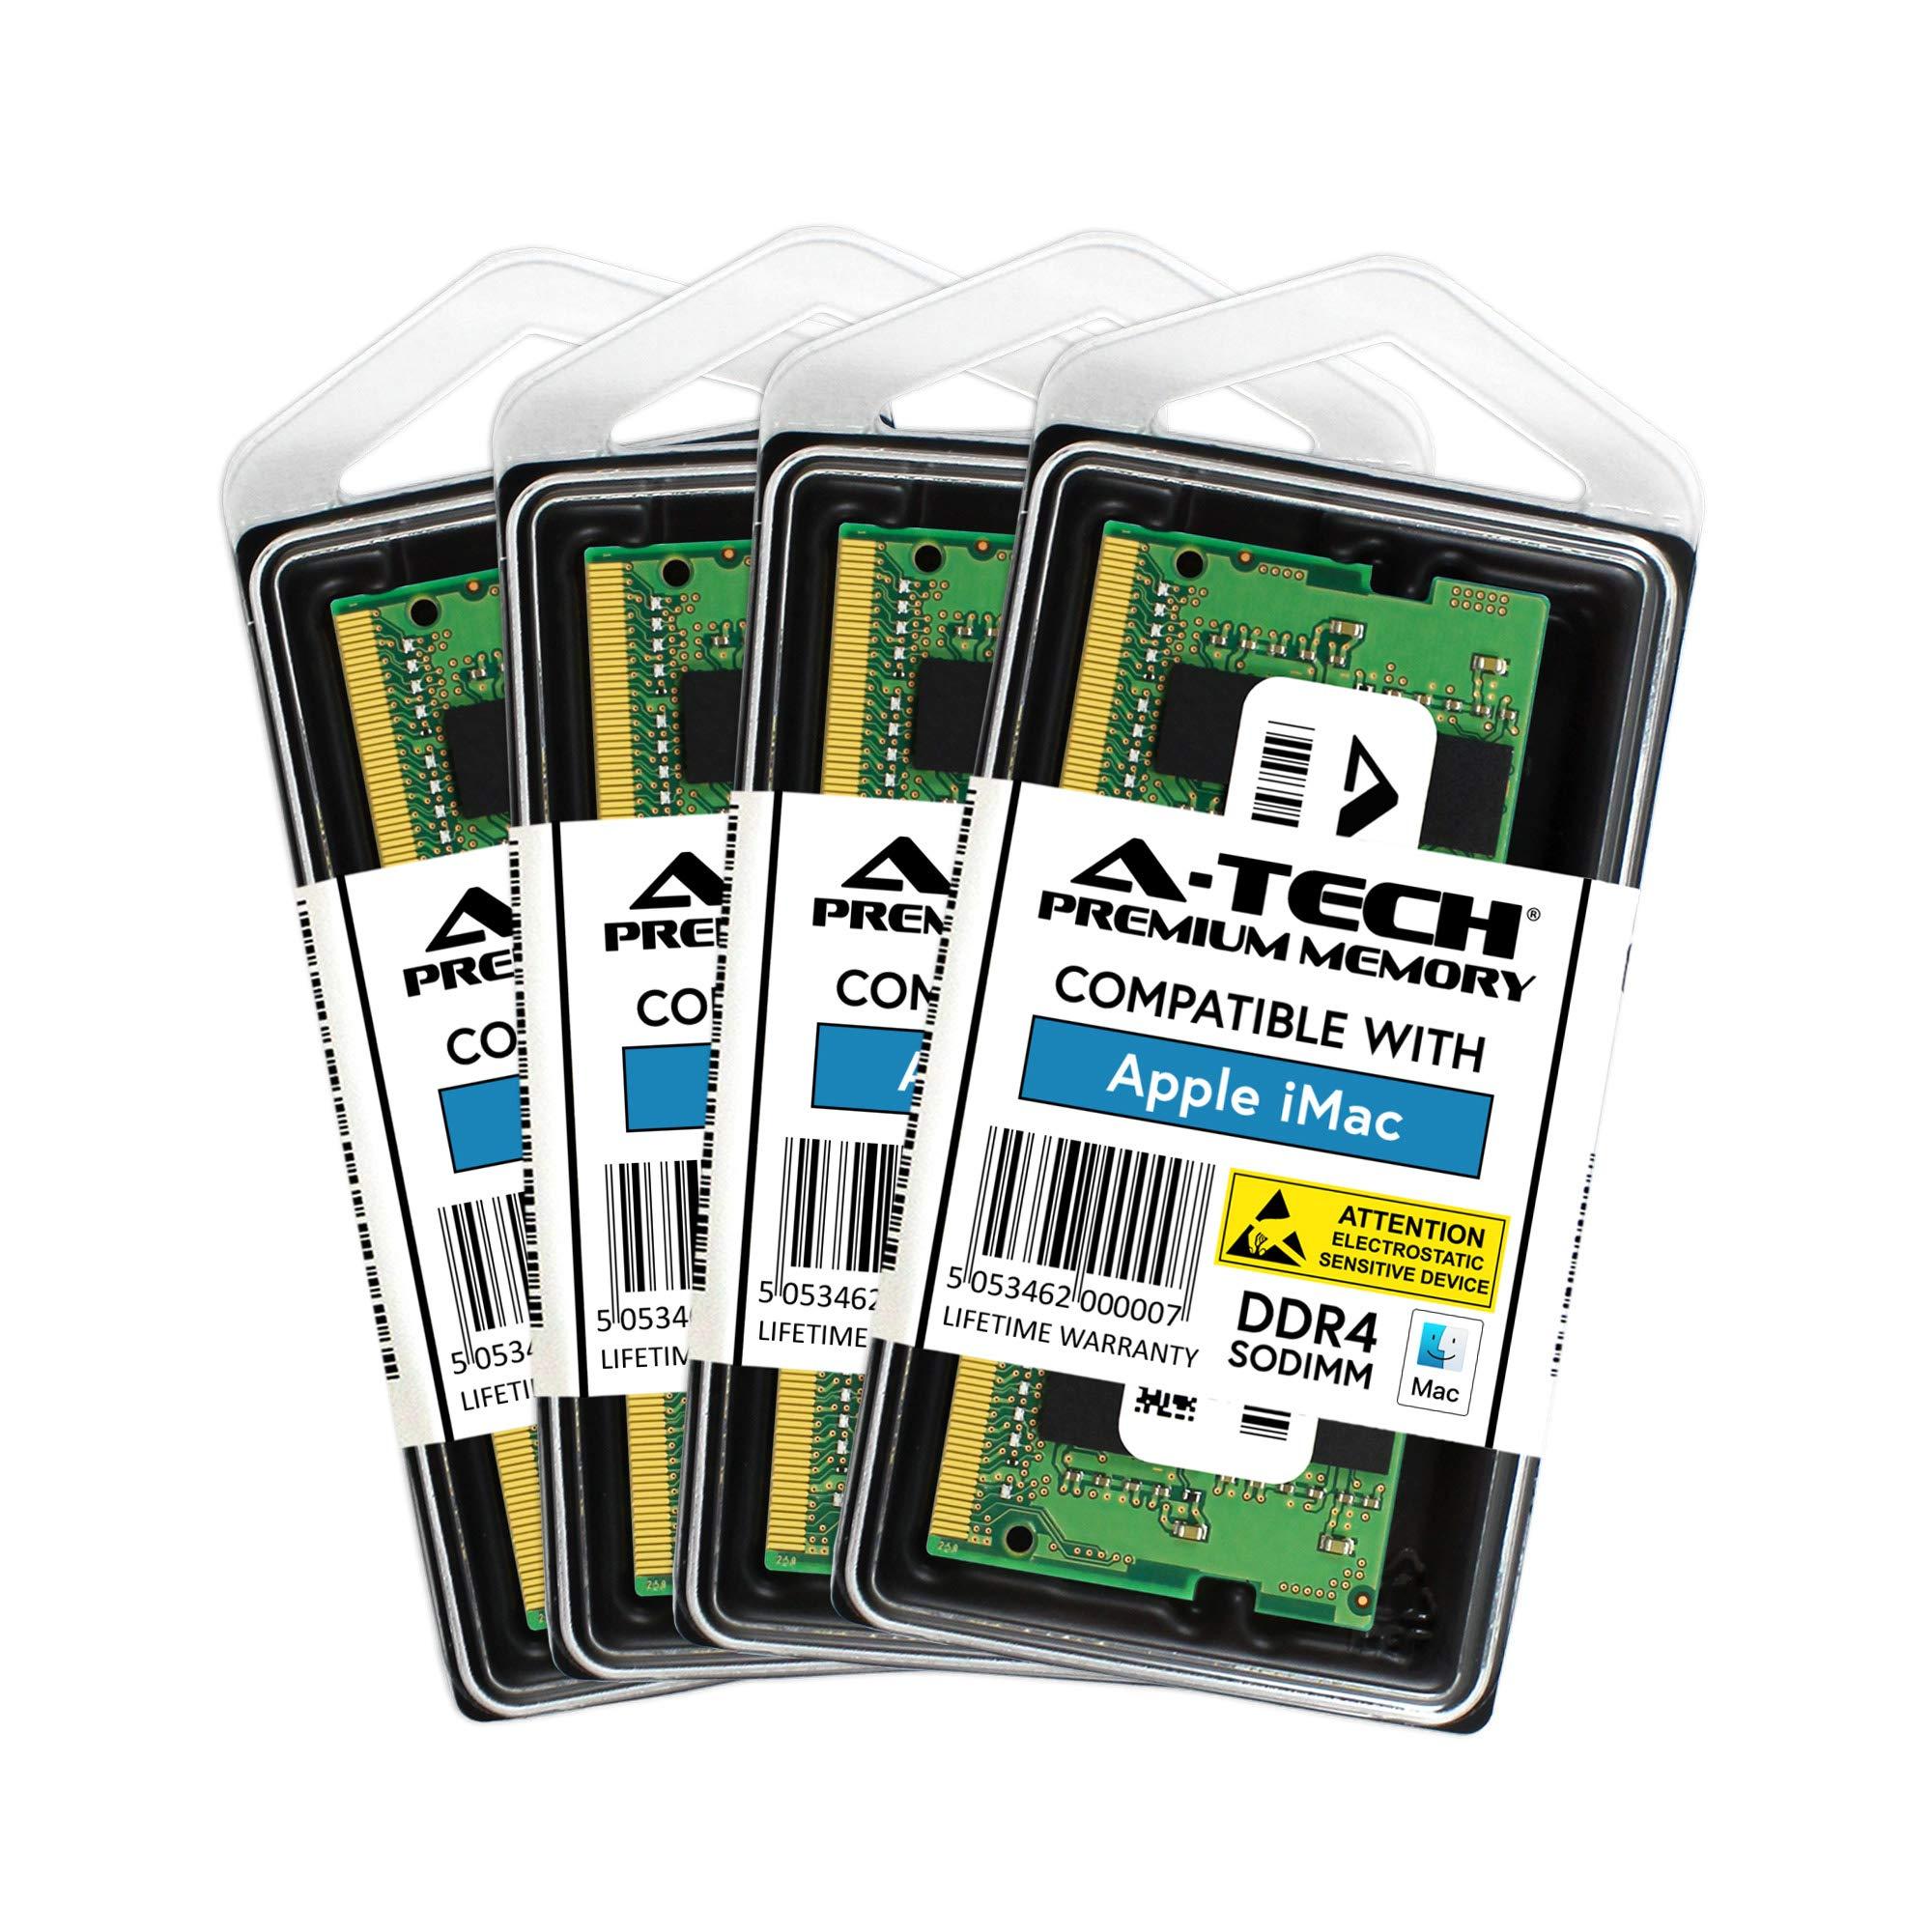 Memoria RAM 64GB A-Tech Kit (4X 16GB) DDR4 2400MHz Upgrade para Apple iMac (2017 Retina 5K 27-inch) A1419 MNE92LL/A MNEA